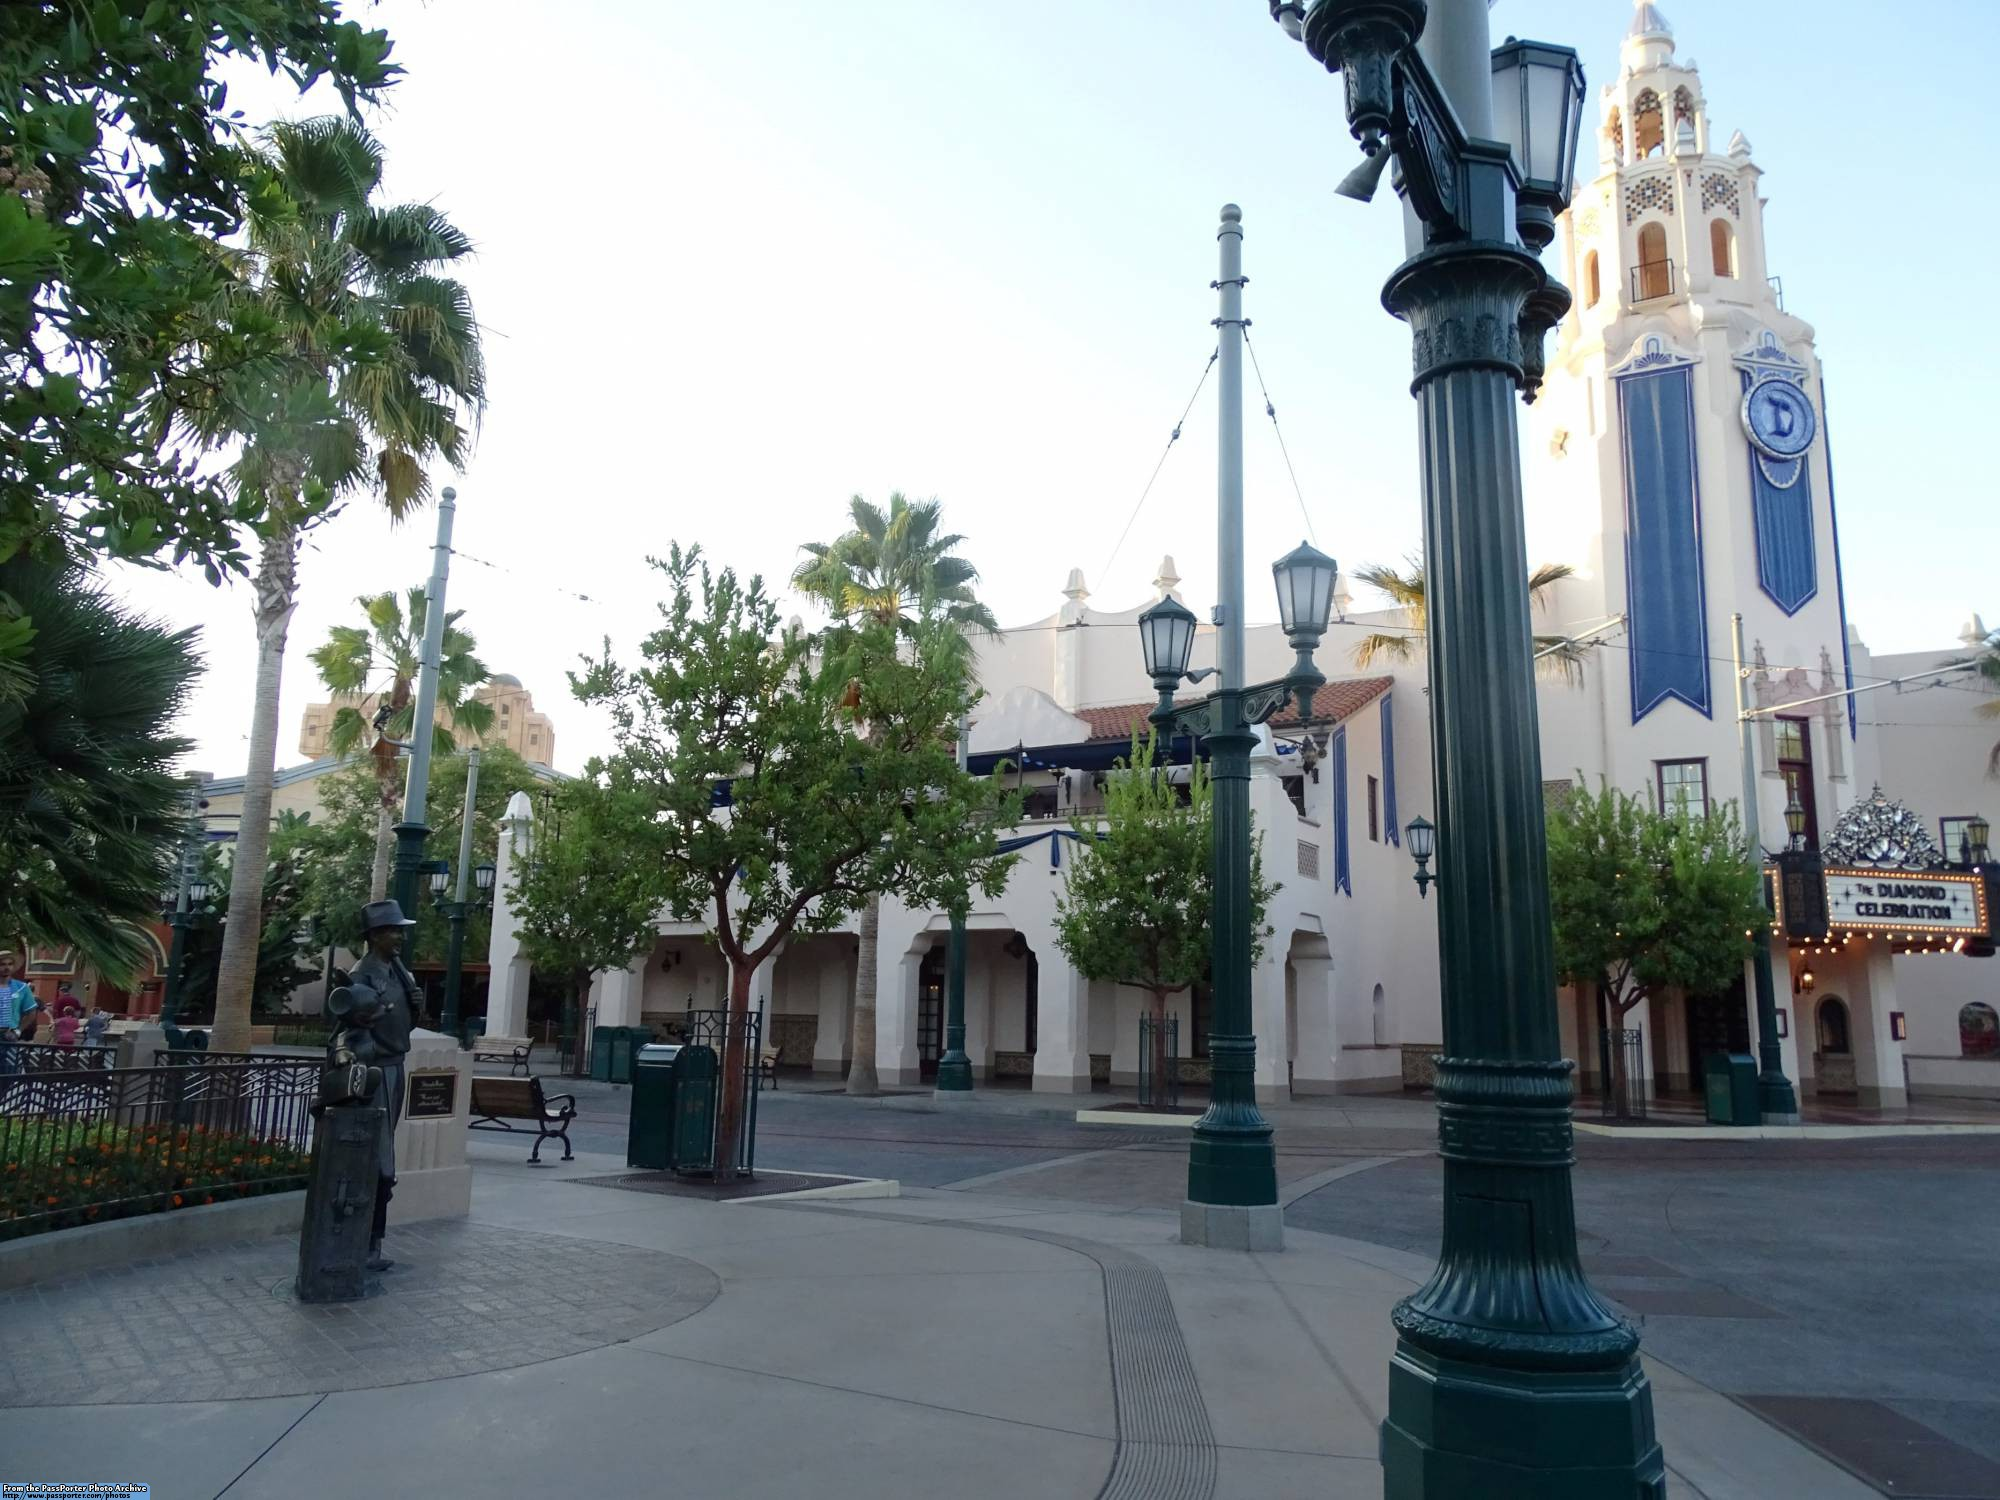 Learn from PassPorter Author Cheryl Pendry's most recent trip to Disneyland   PassPorter.com